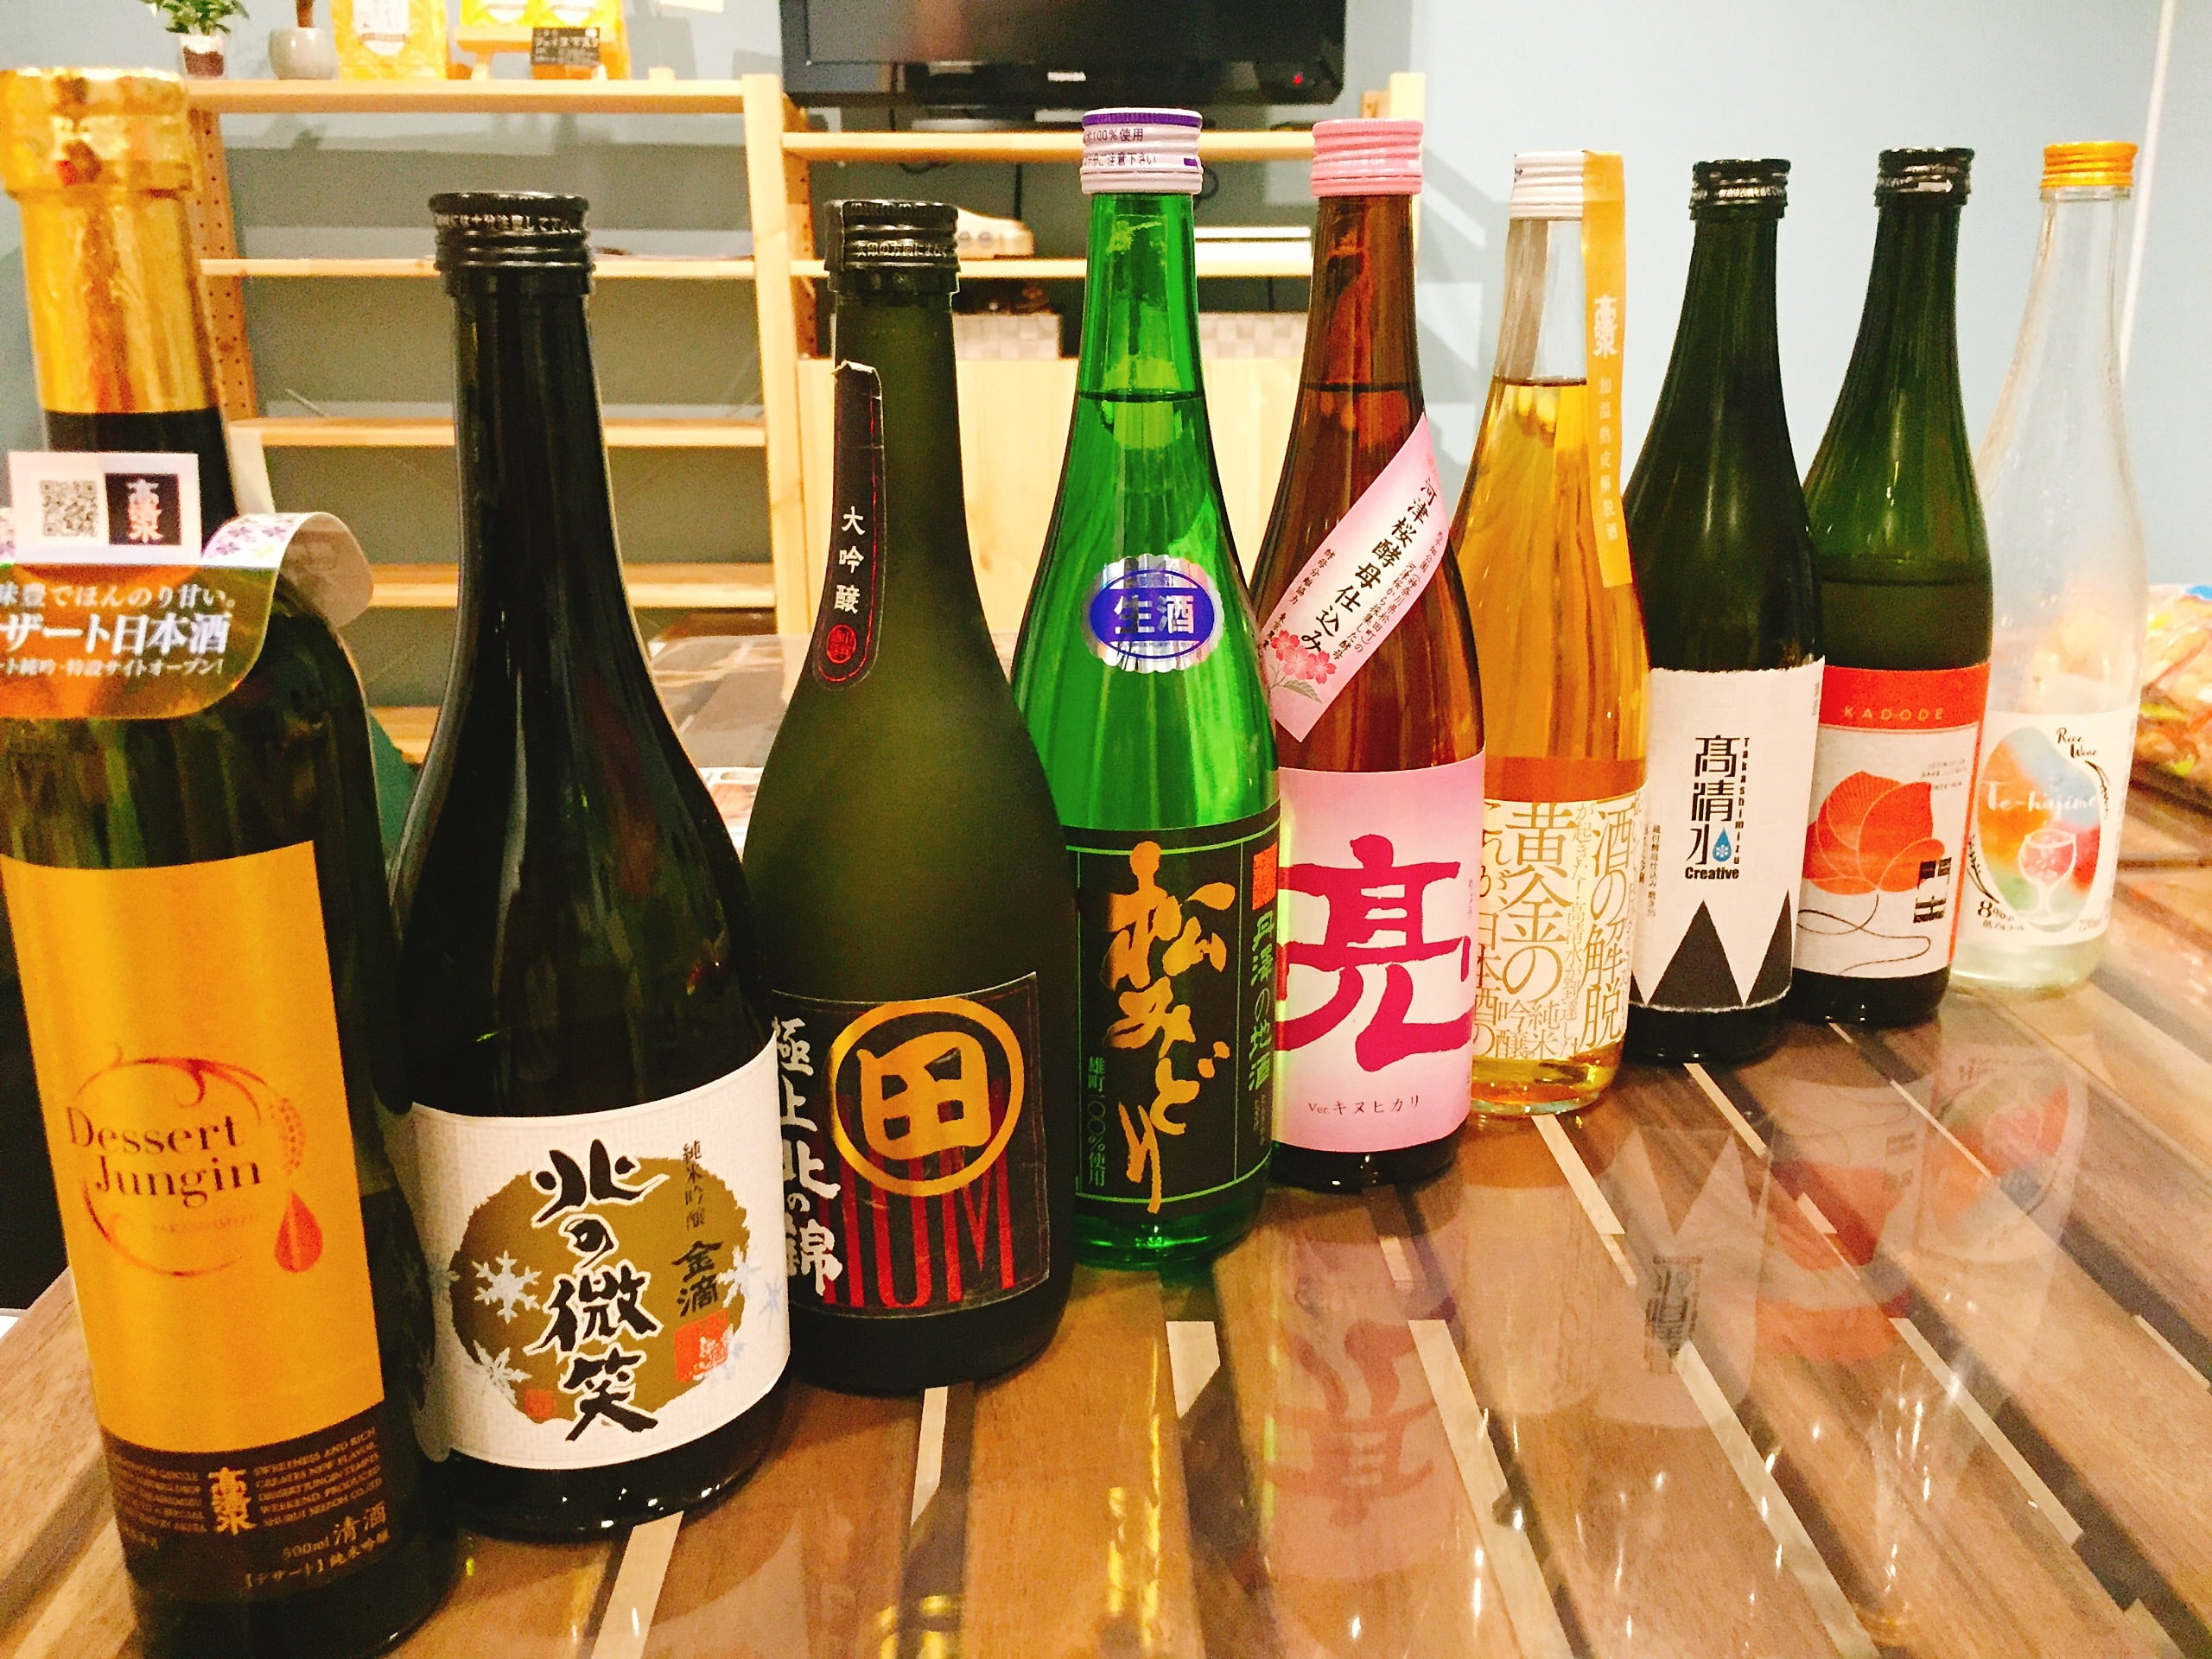 Rselect ★ 2019/7/29 ★ 日本酒会のイメージその2